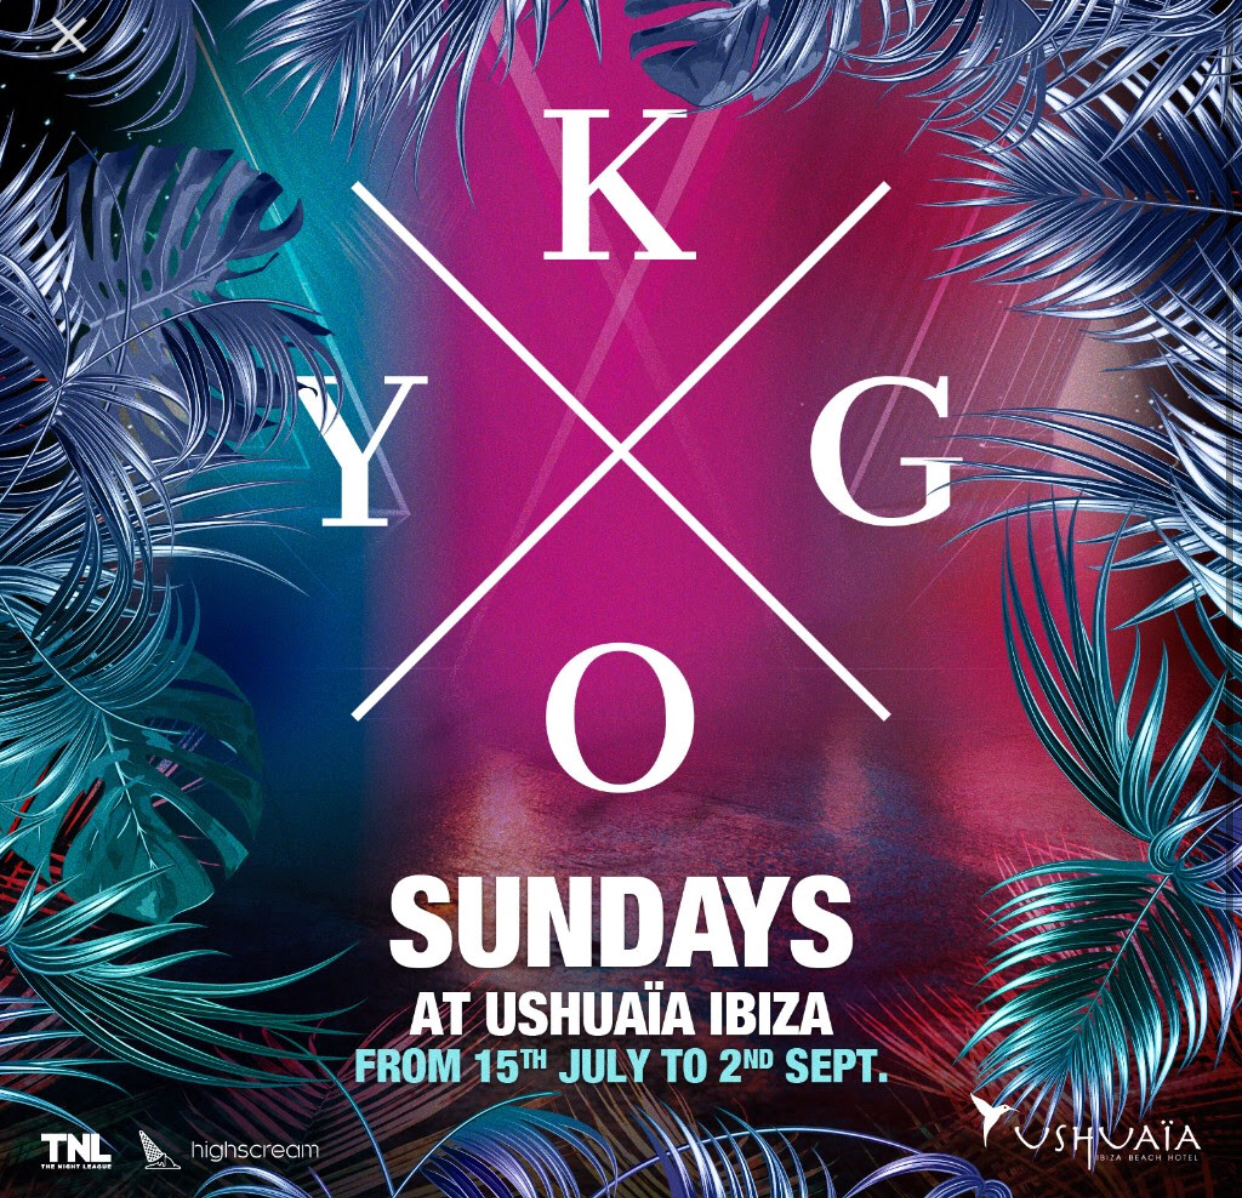 2hr open bar + Kygo @ Ushuia Ibiza package